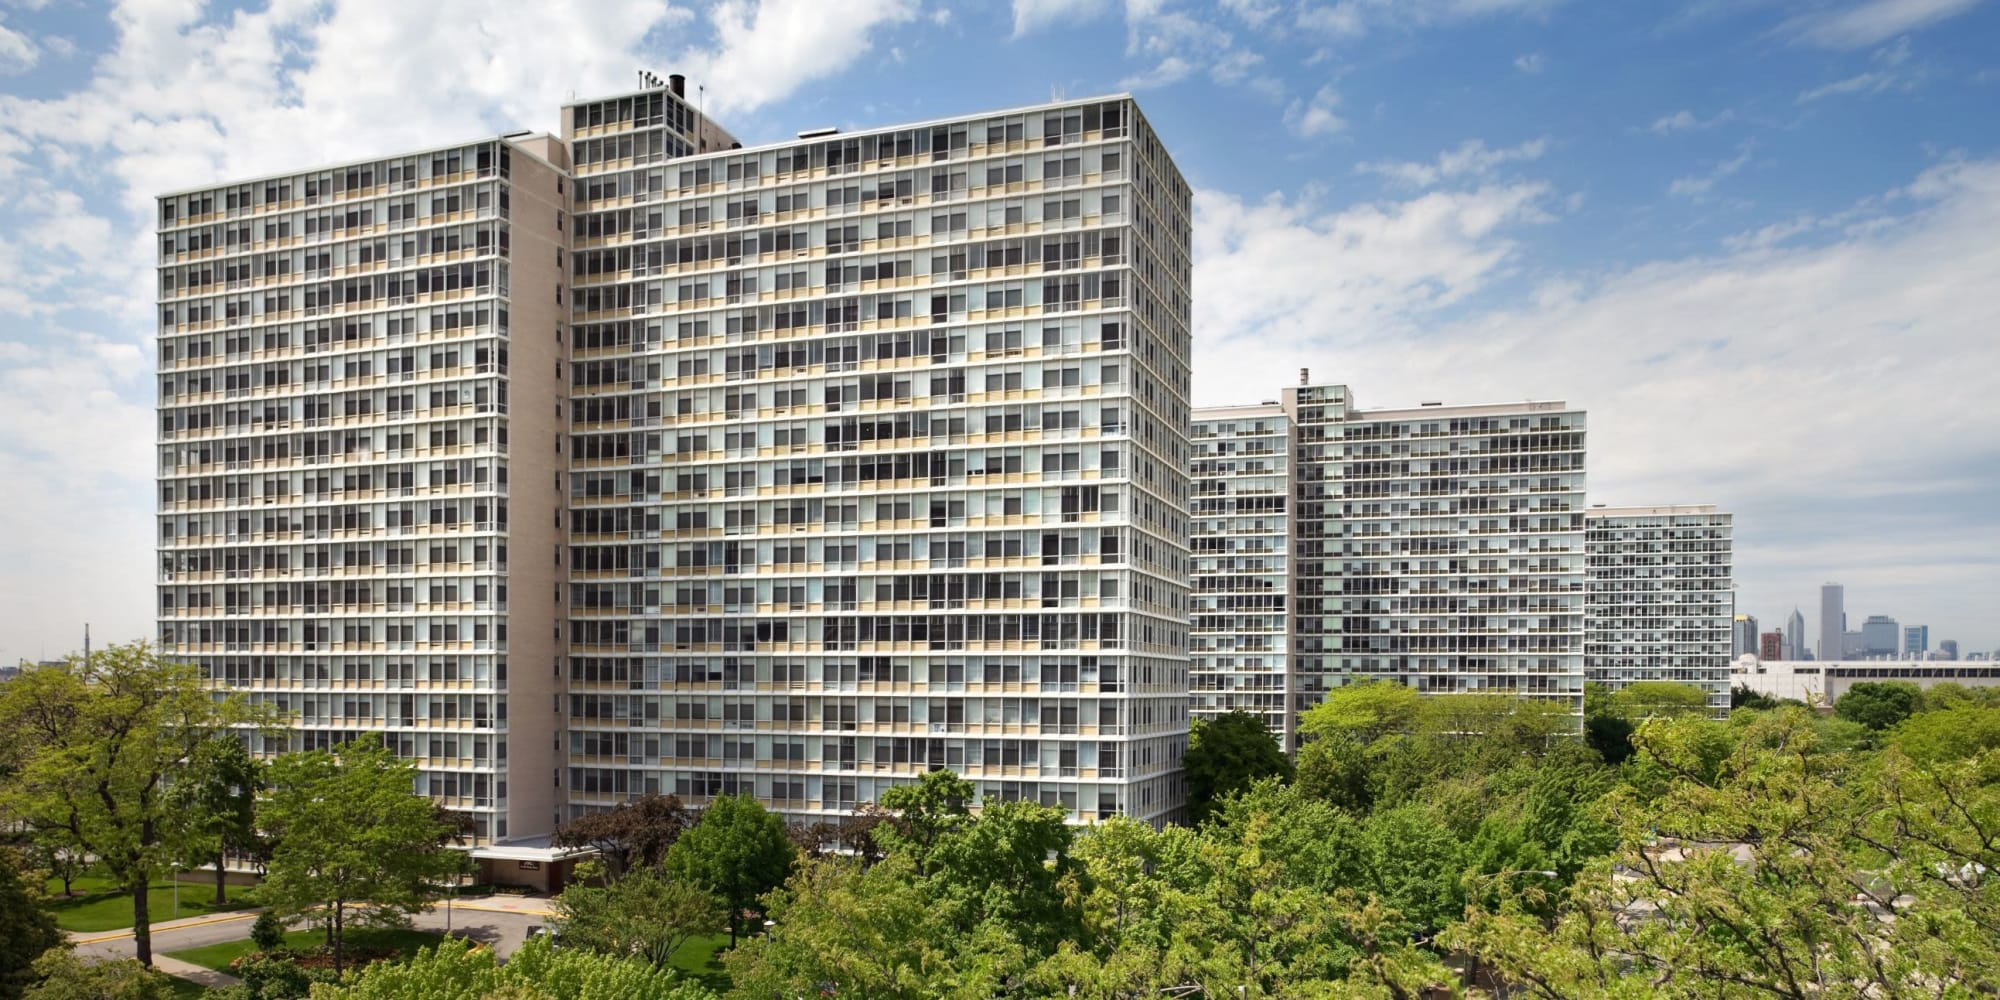 Luxury apartments at Prairie Shores in Chicago, Illinois